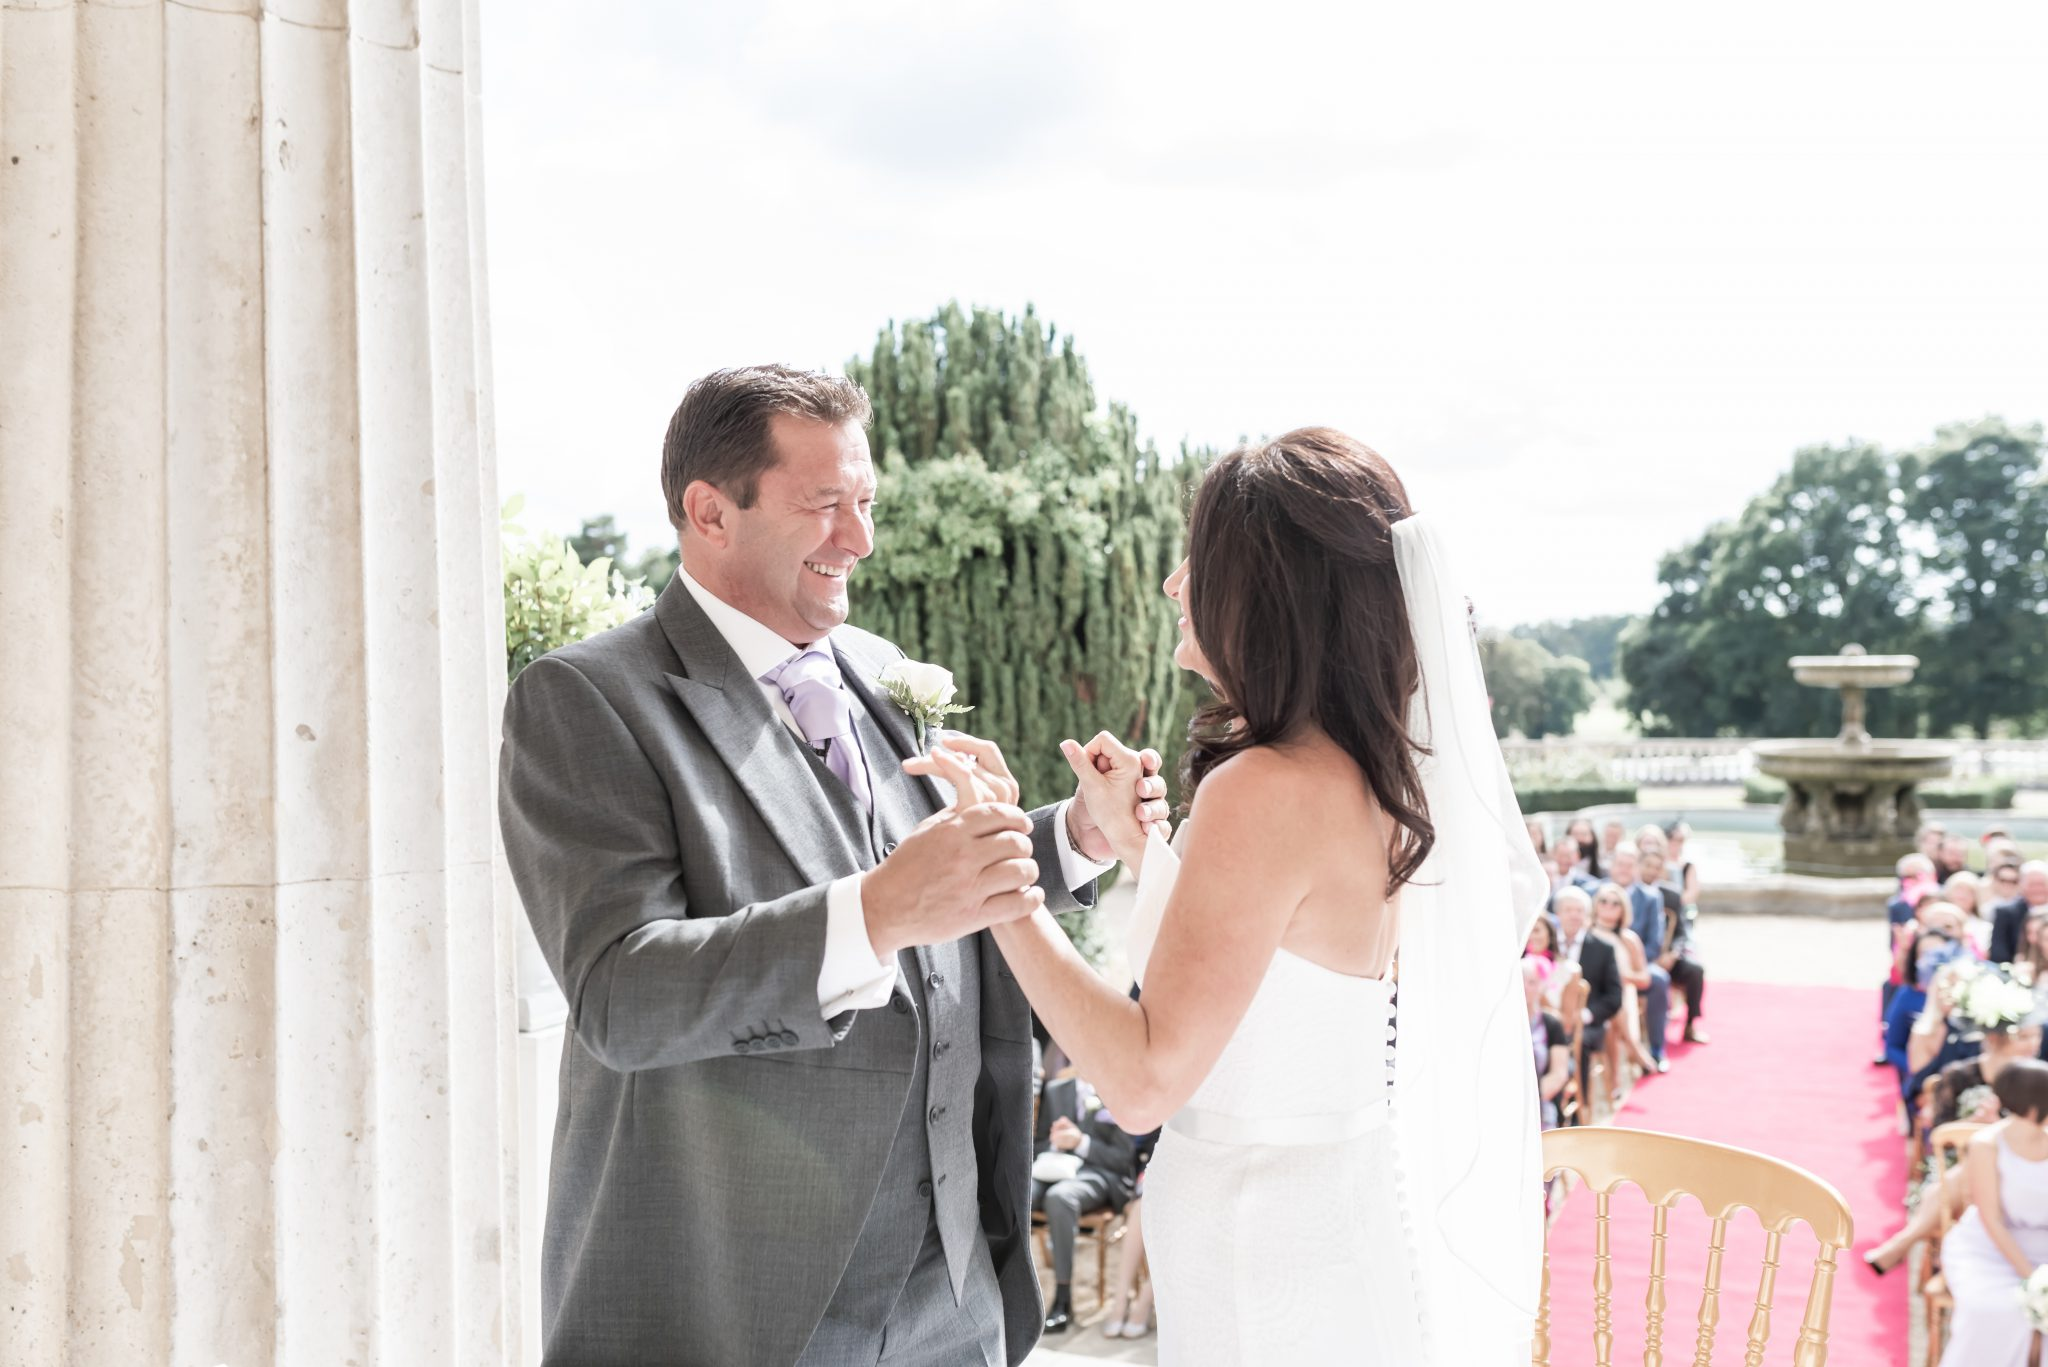 LGFA Sally & Errol Wedding, Stoke Park